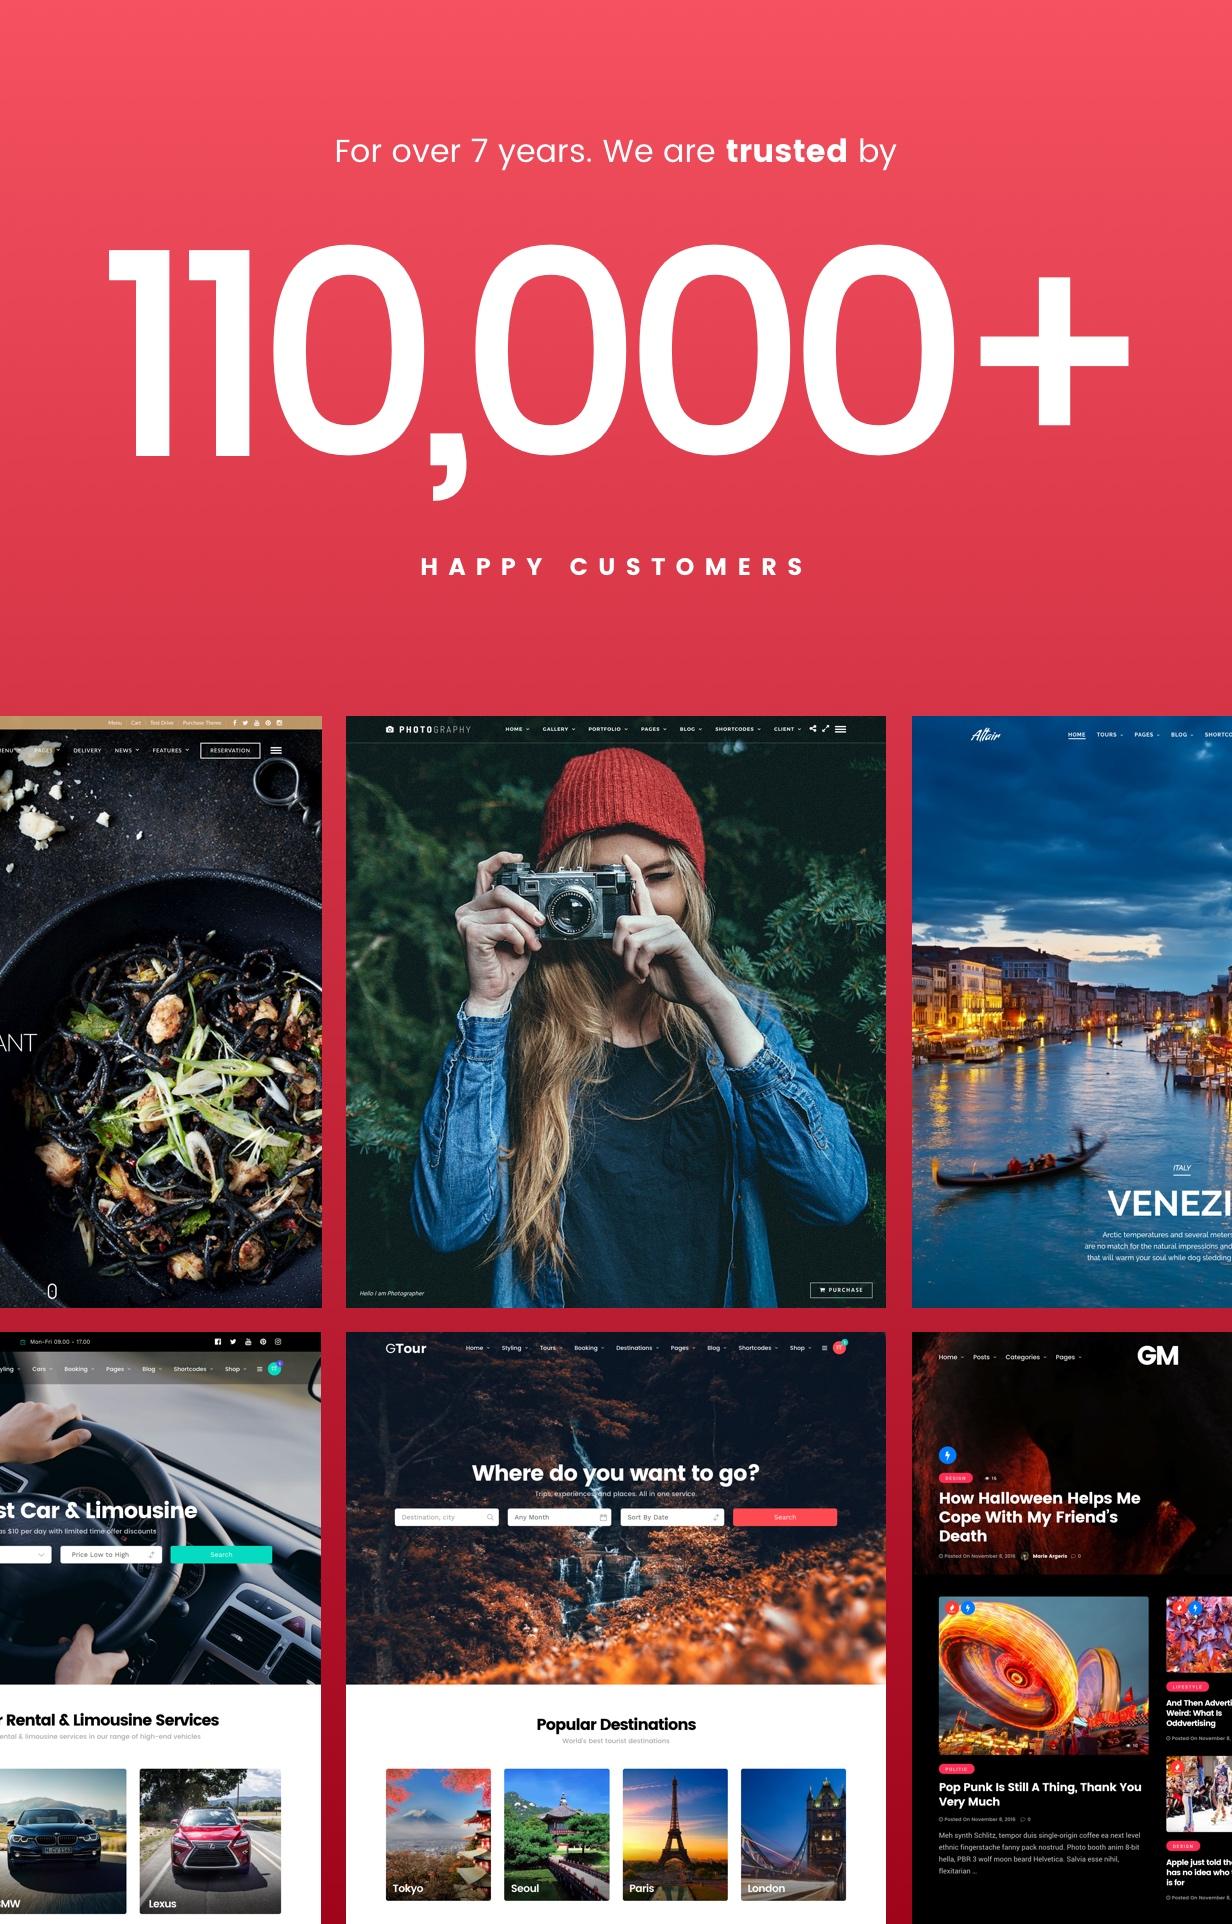 core3 - Core Minimalist Photography Portfolio